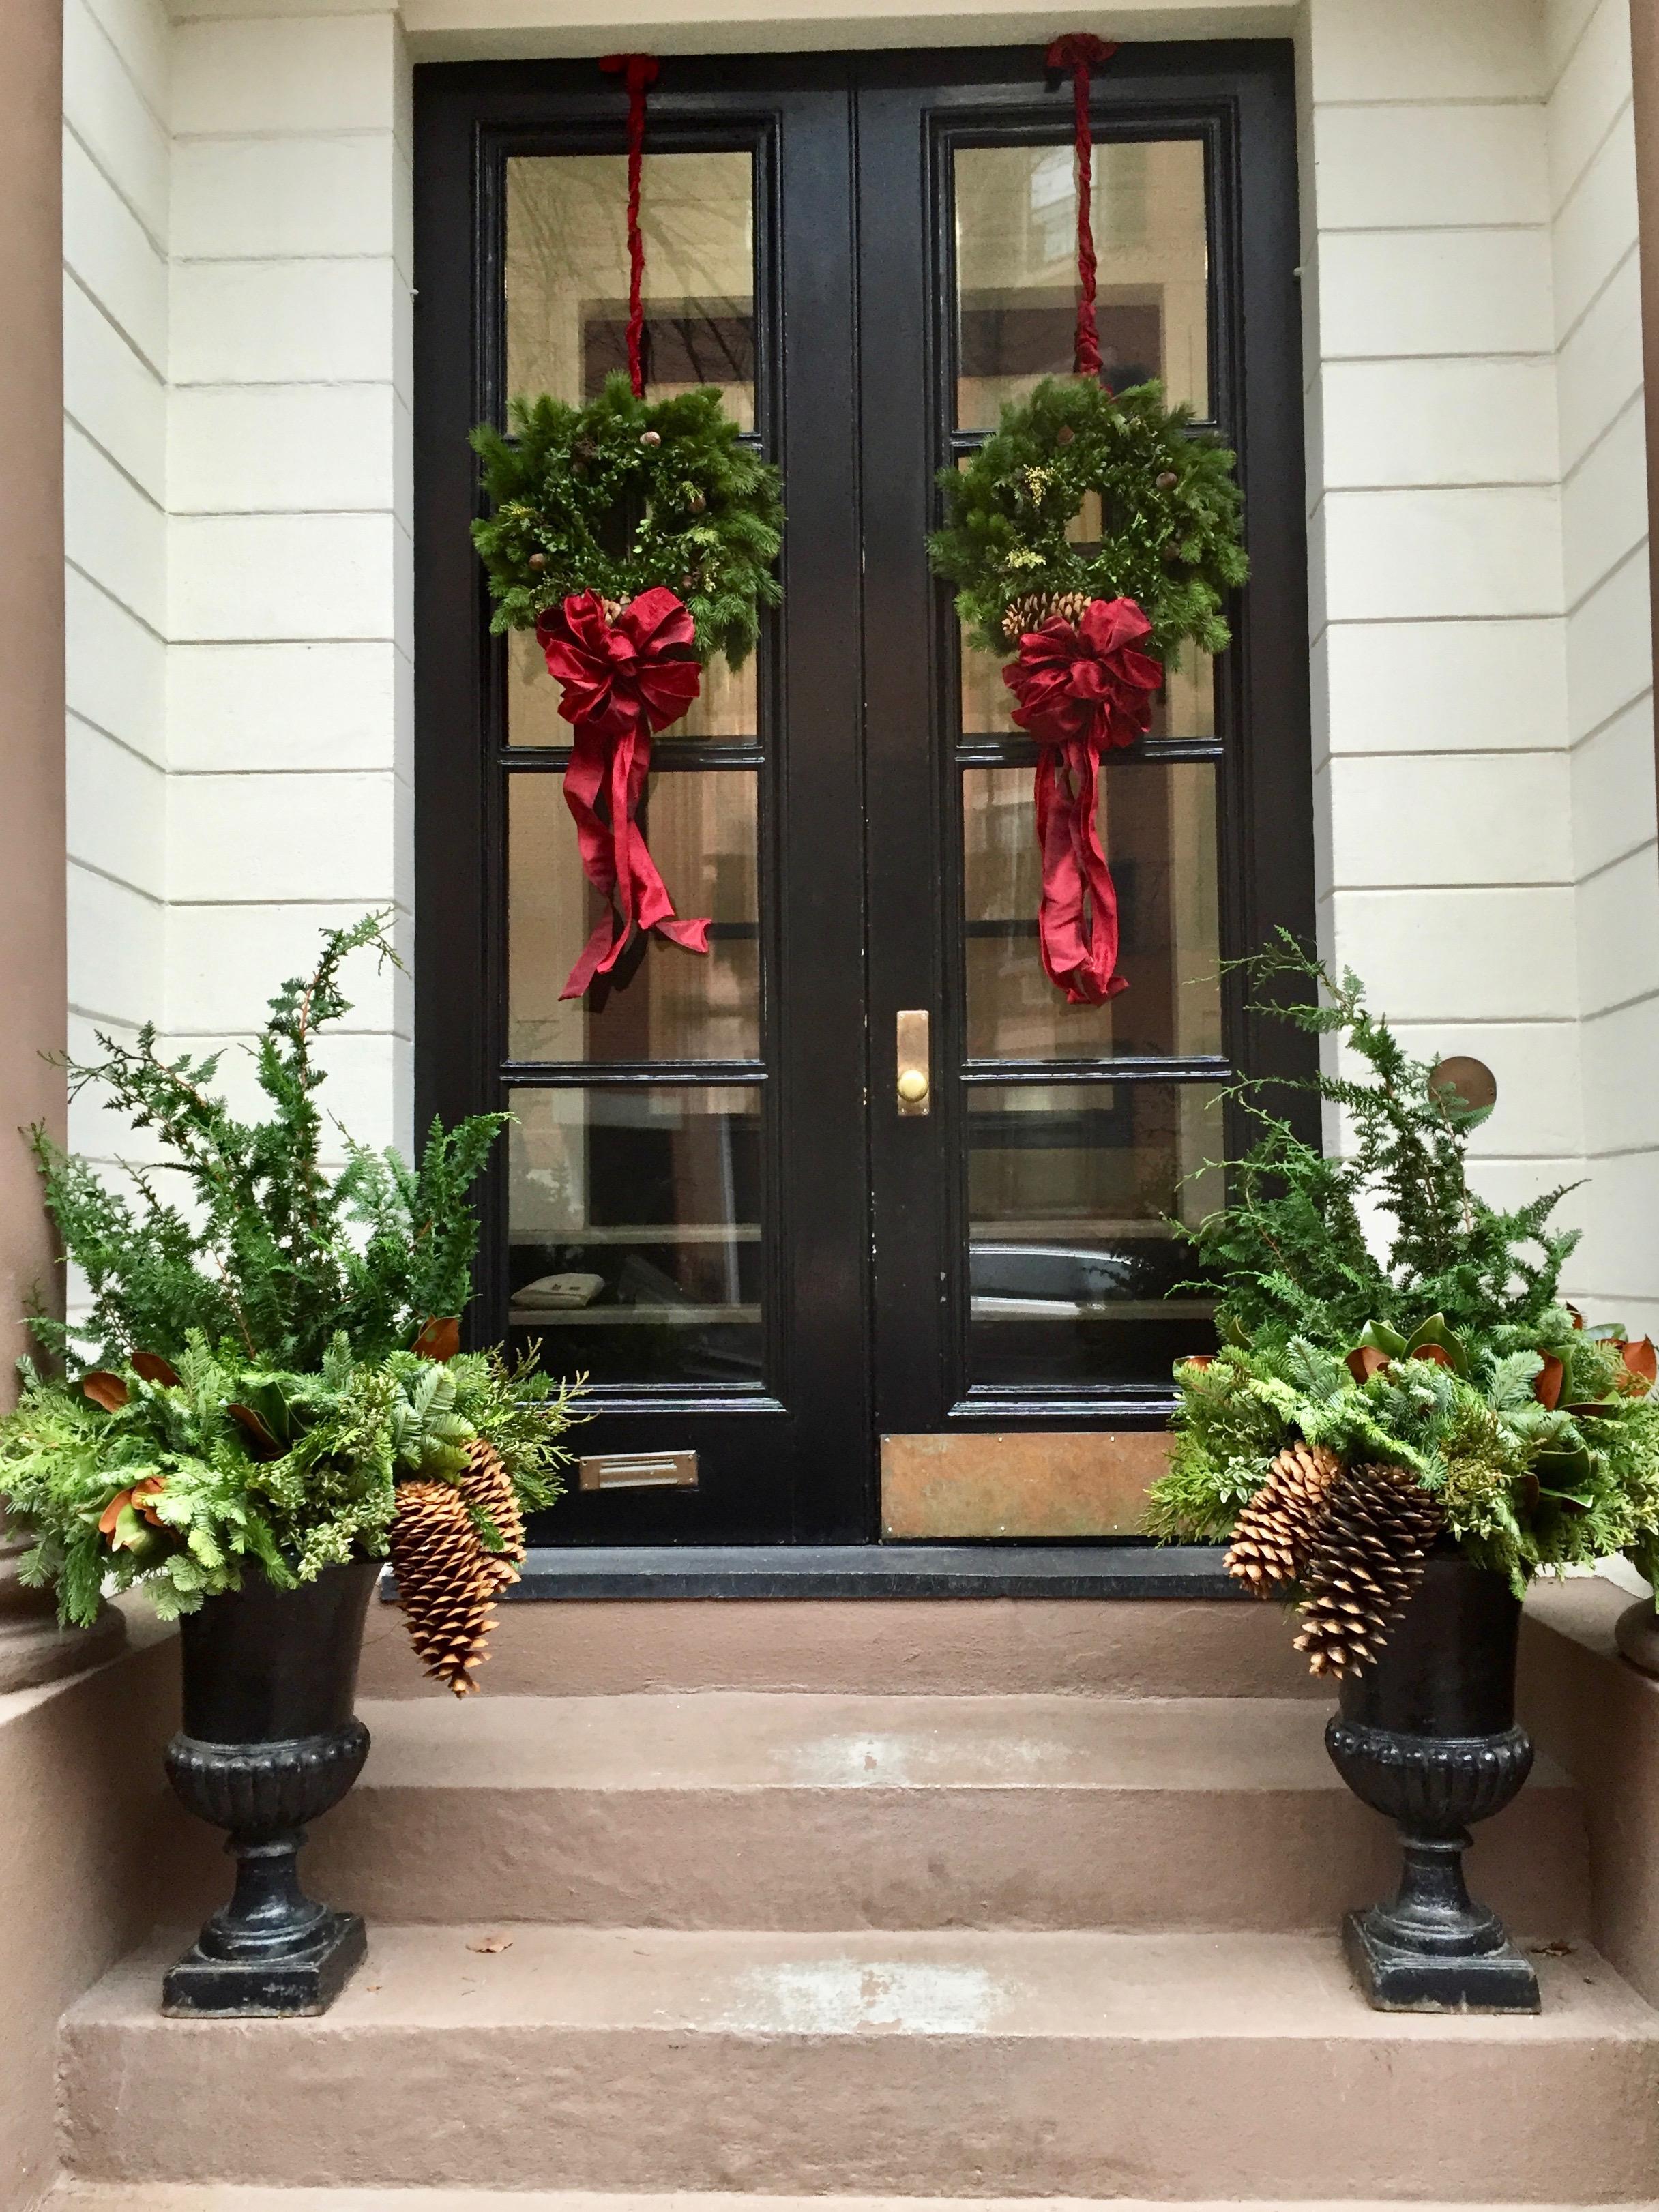 Beacon Hill Christmas Door Boston MA New England.jpg